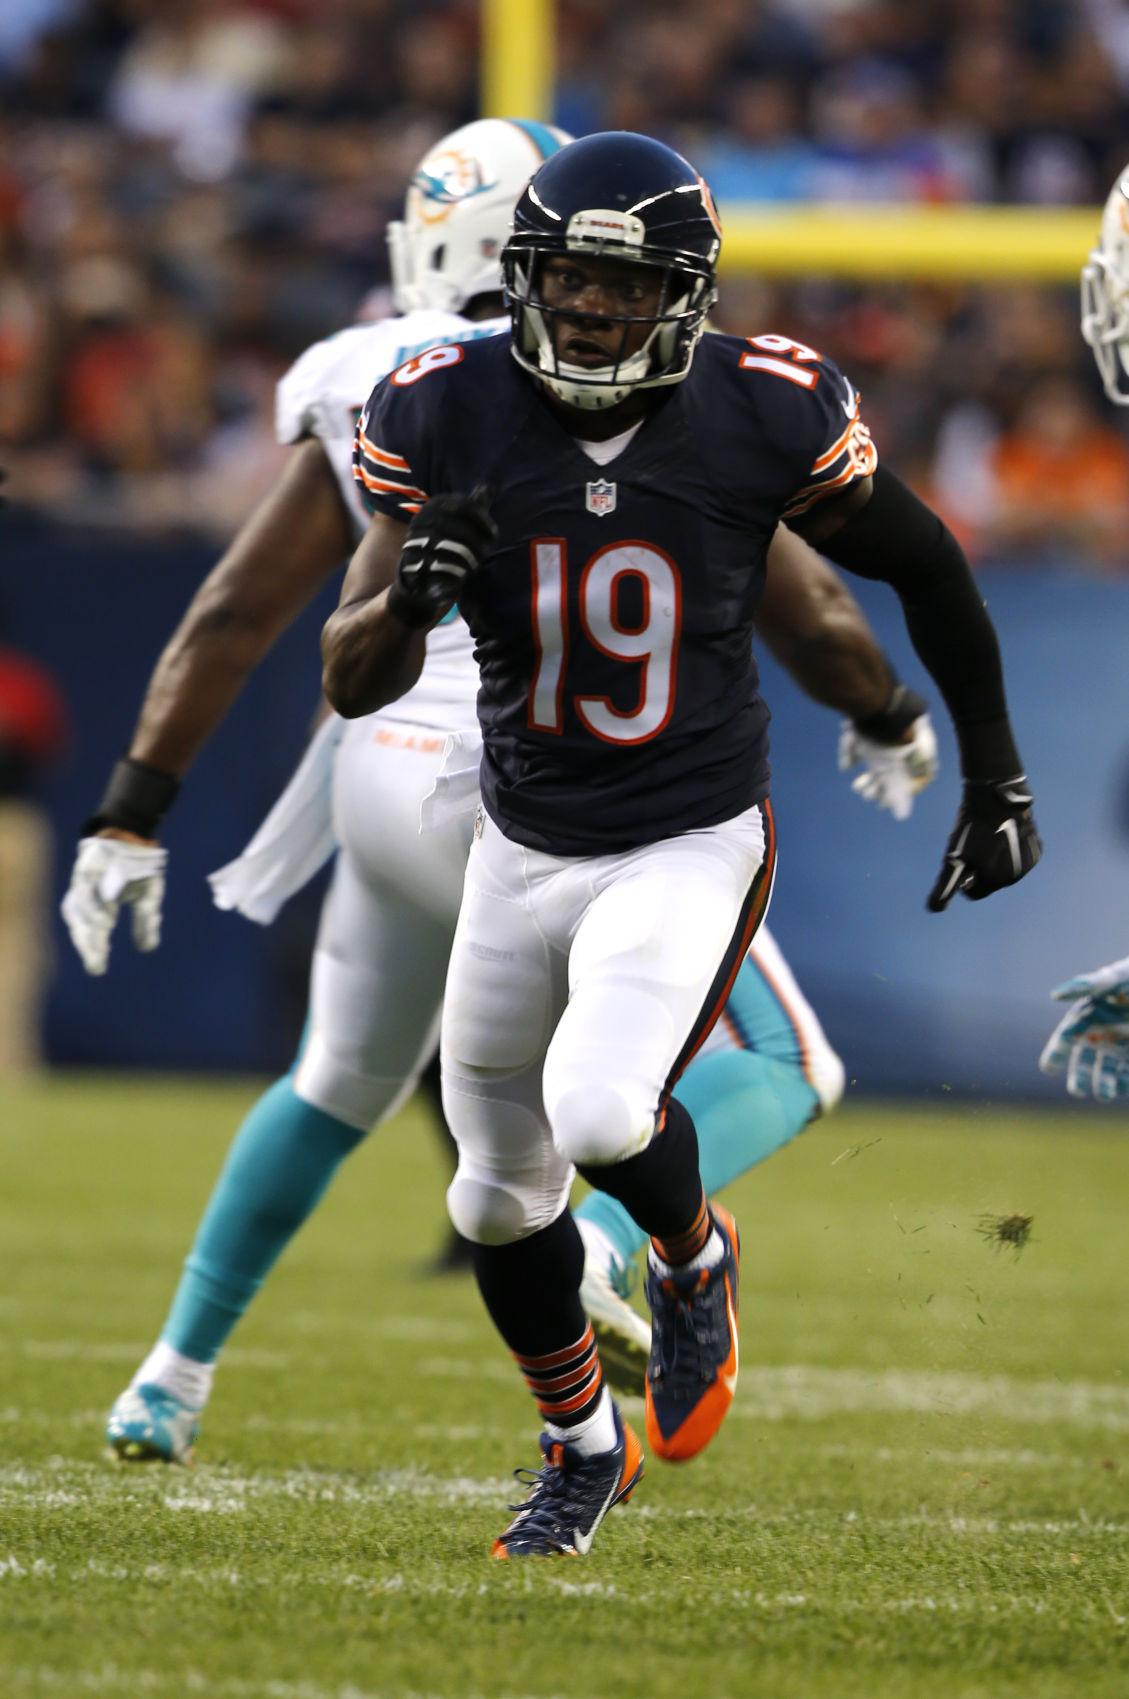 NFL Jerseys - Bears veteran receiver Royal is a clutch player | Chicago Bears ...